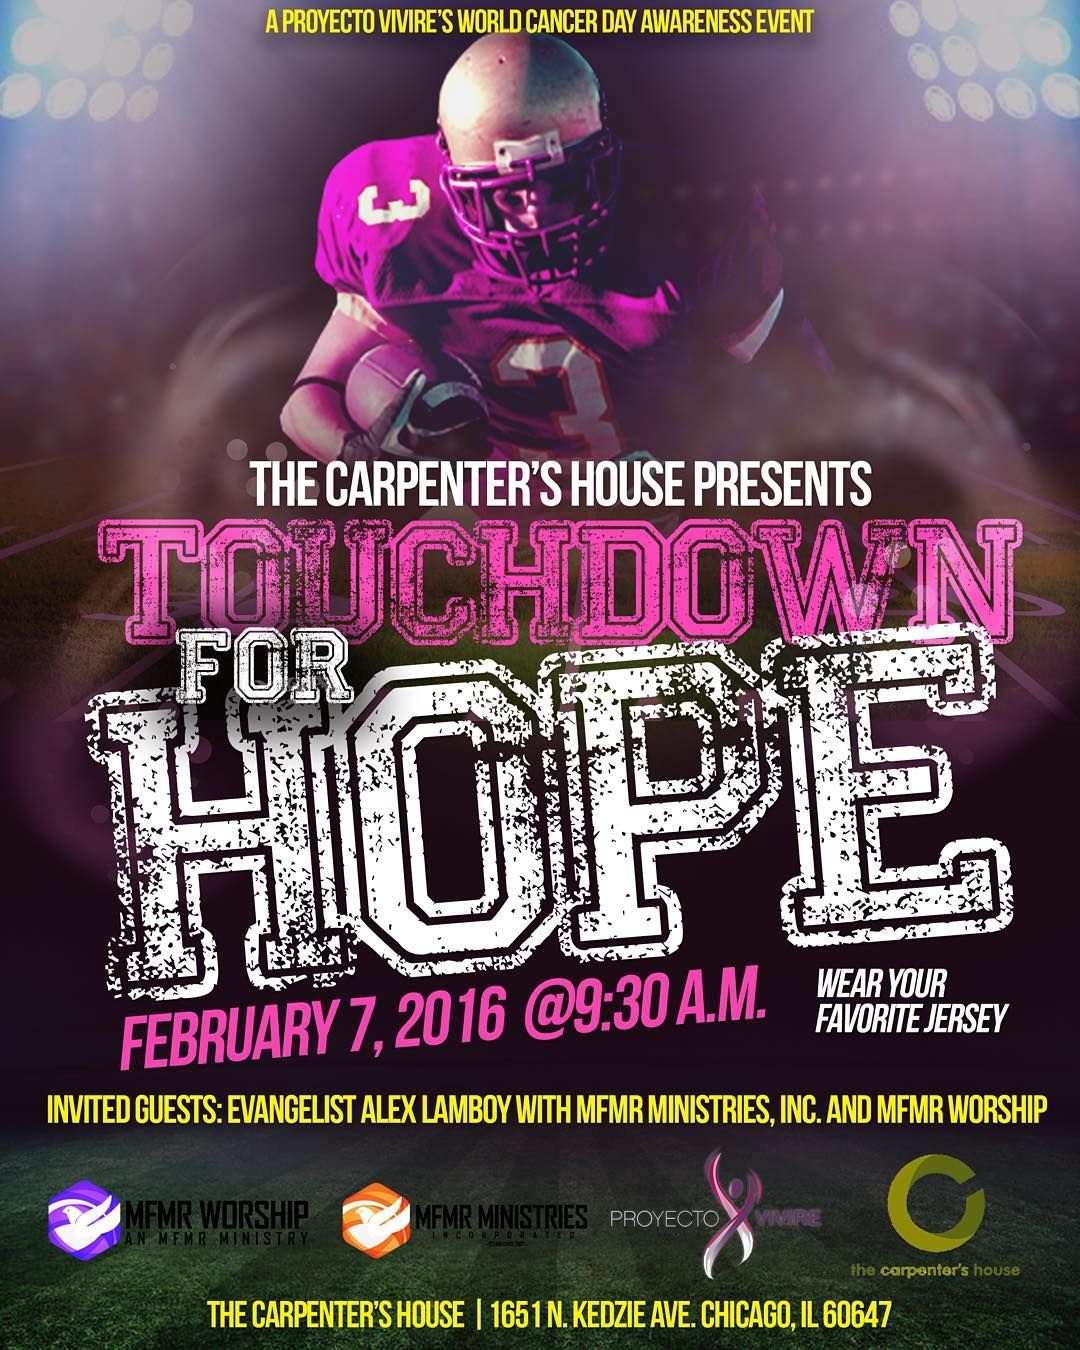 A Proyecto Vivire World Cancer Day Awareness Event.  English 9:30am Español 11:30am  #mfmr #mfmrministries #proyectovivire #cancer #cancerawareness #worldcancerday #superbowlsunday #superbowl #jersey #mfmrworship #hope by alexlamboy